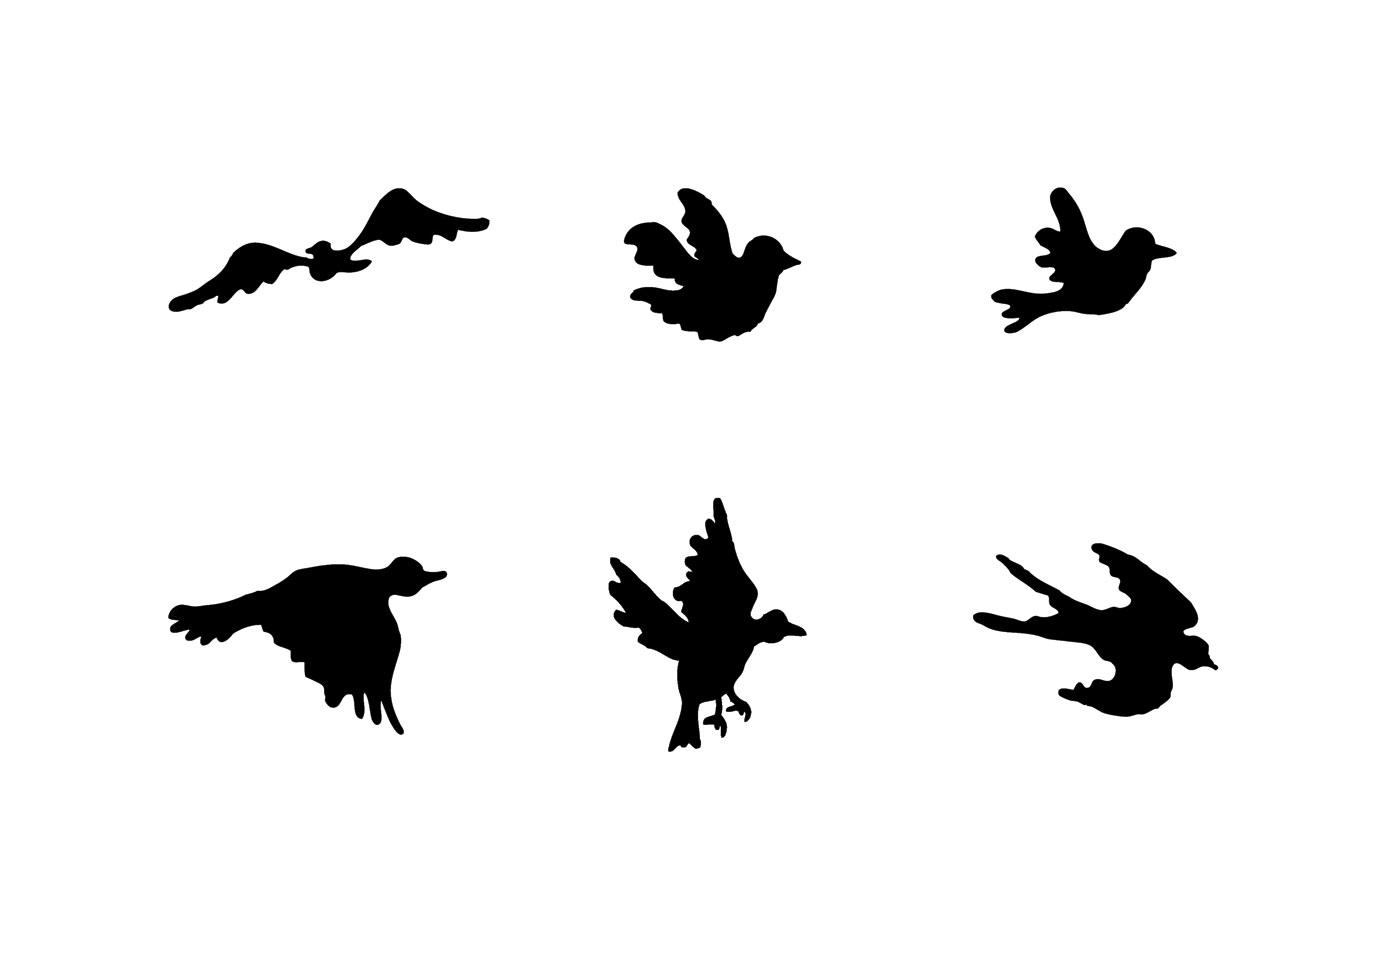 Free Flying Bird Silhouette Vector Series - Download Free Vectors, Clipart Graphics & Vector Art